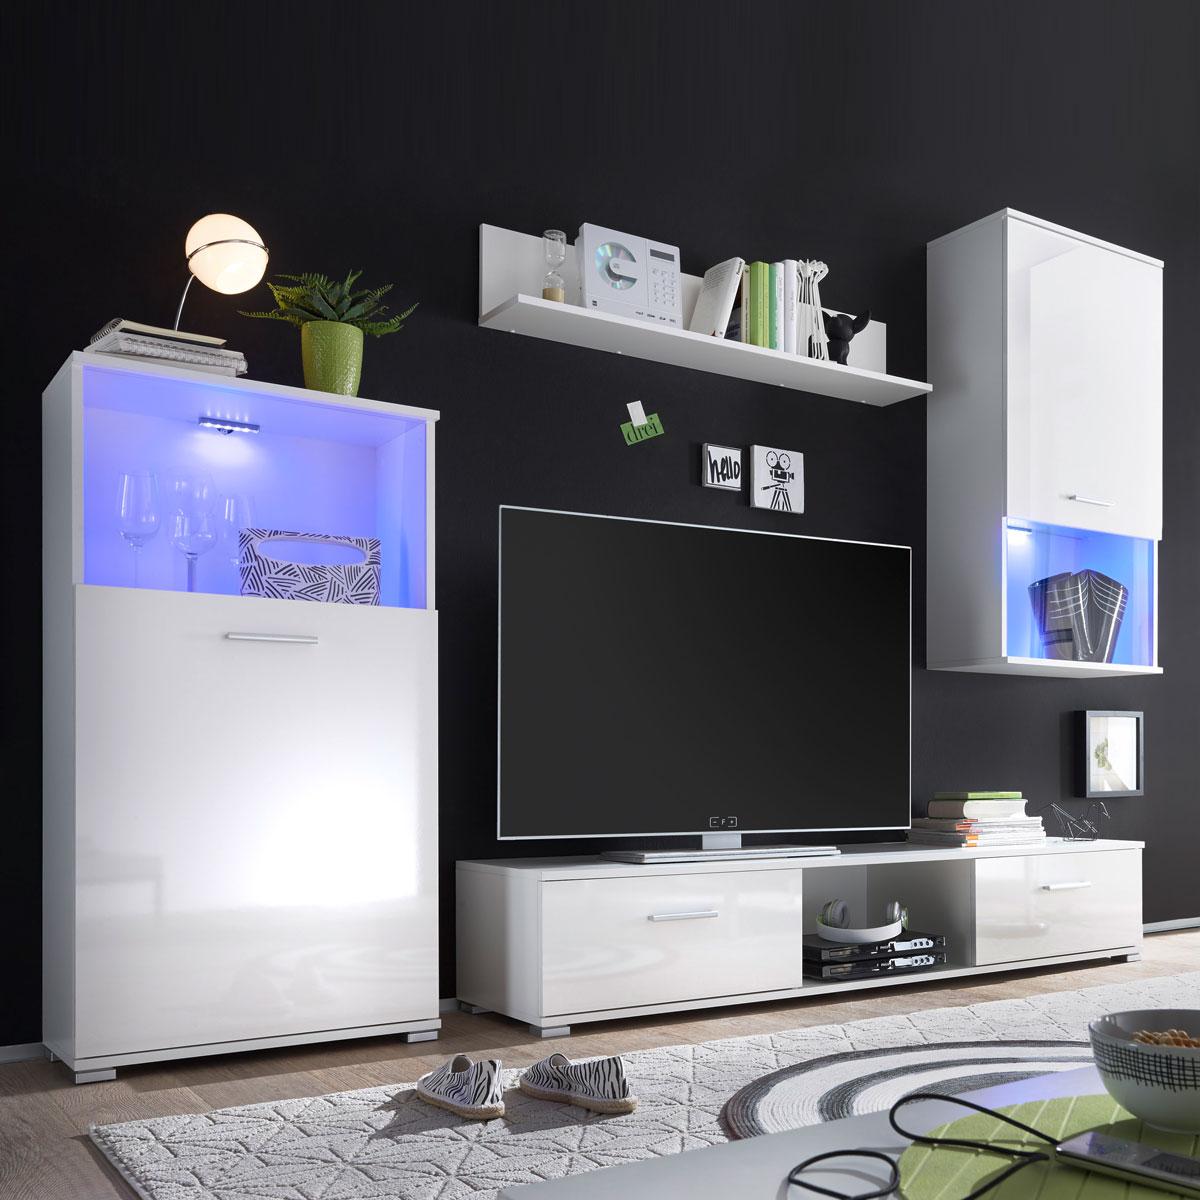 wohnwand lucky lux anbauwand front wei hochglanz vitrinen mit rgb led ebay. Black Bedroom Furniture Sets. Home Design Ideas